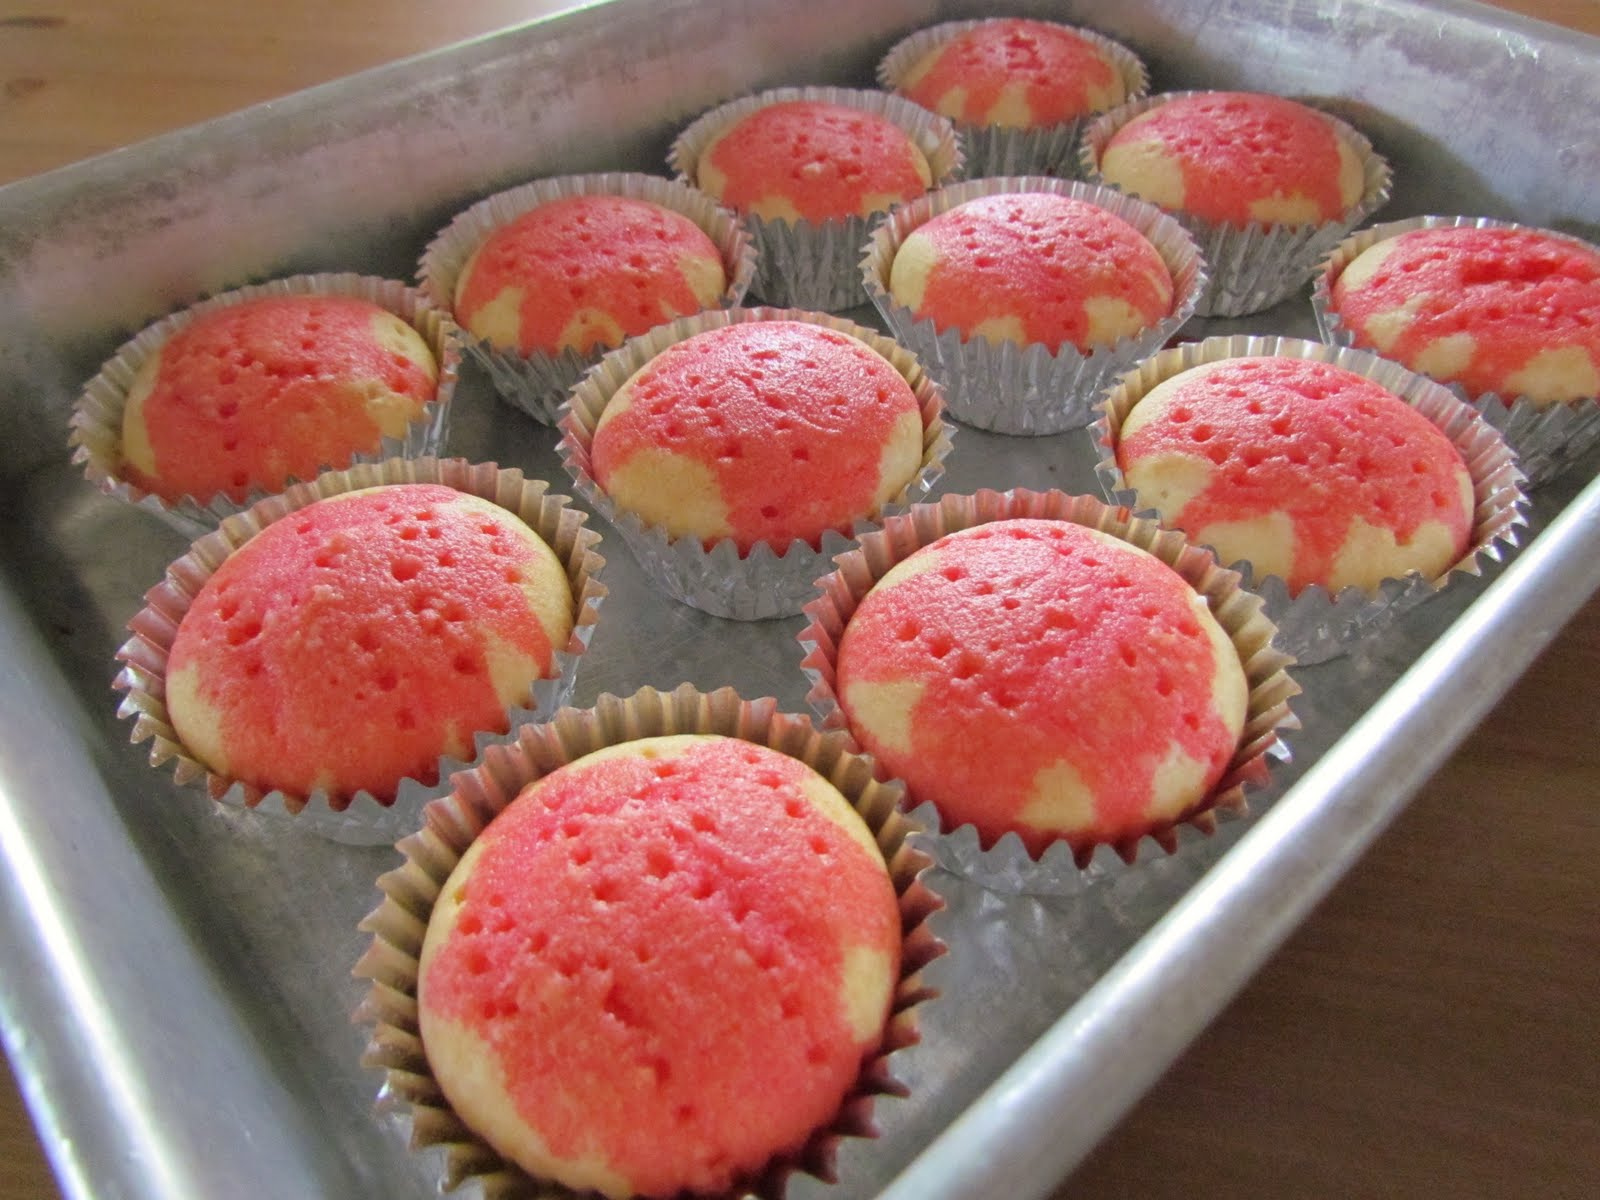 Strawberry Jell-O Poke Cupcakes